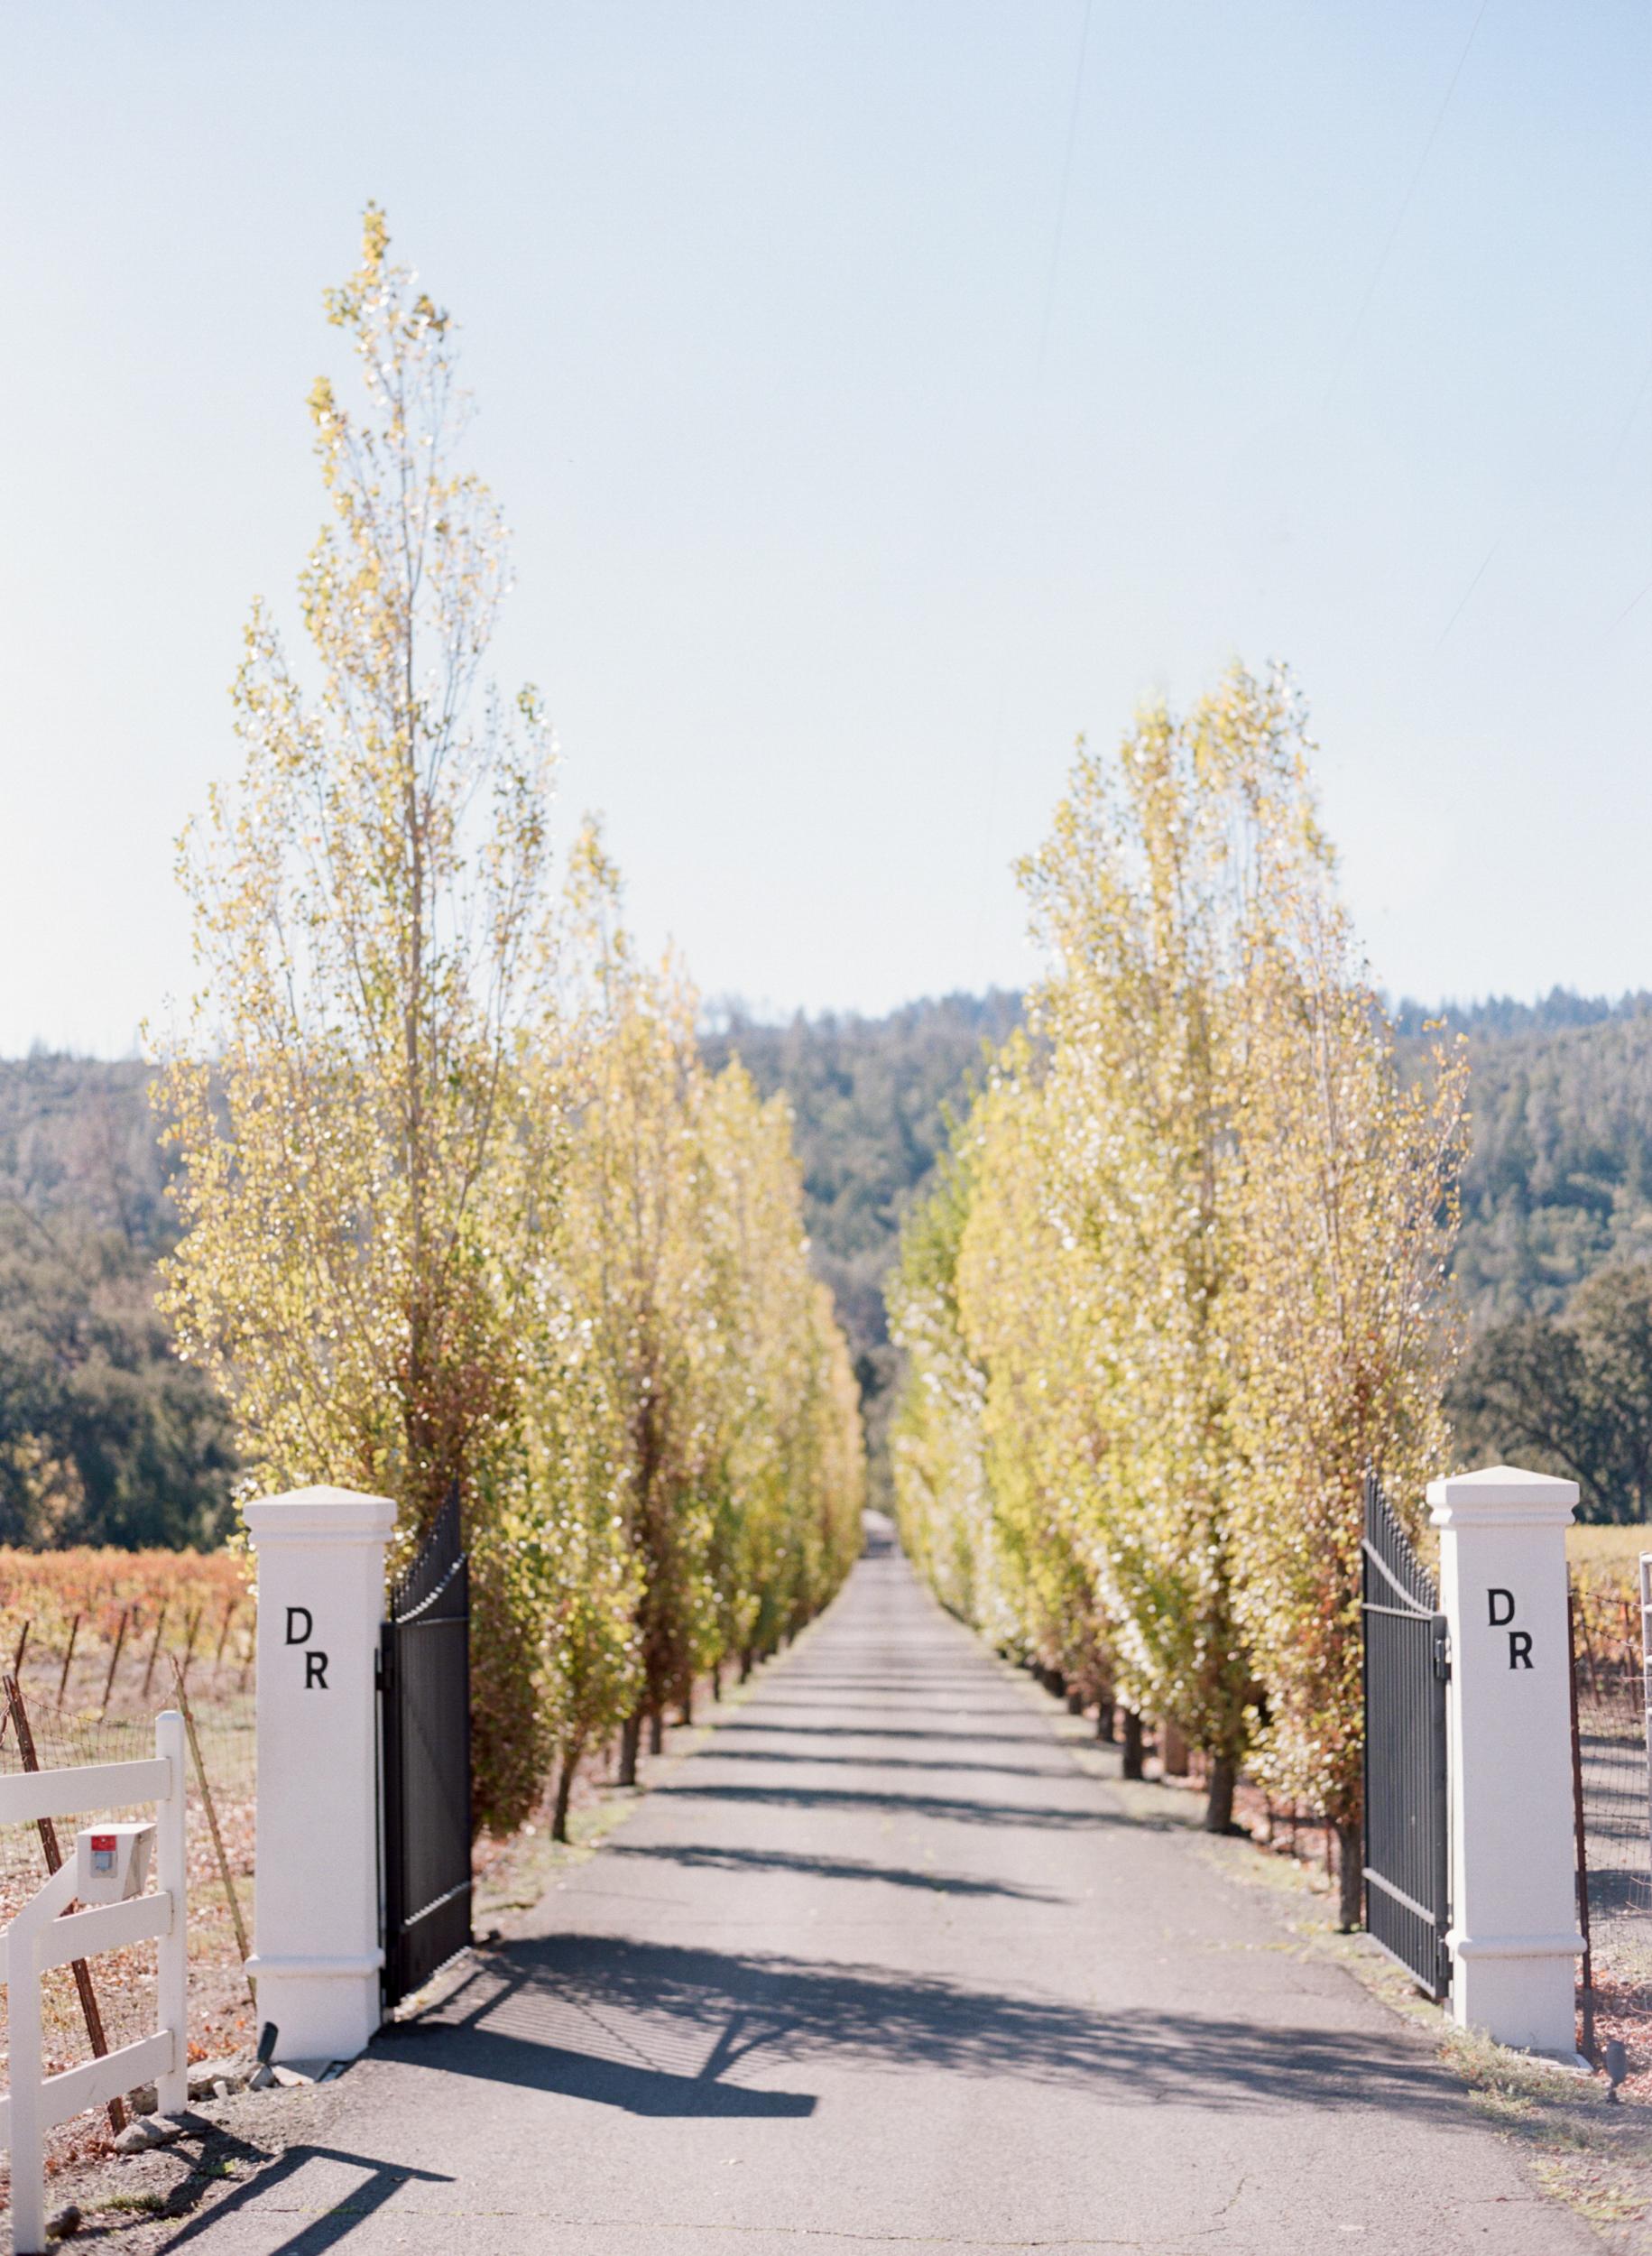 Entrance to Durham Ranch in Napa Valley, California; Sylvie Gil Photography